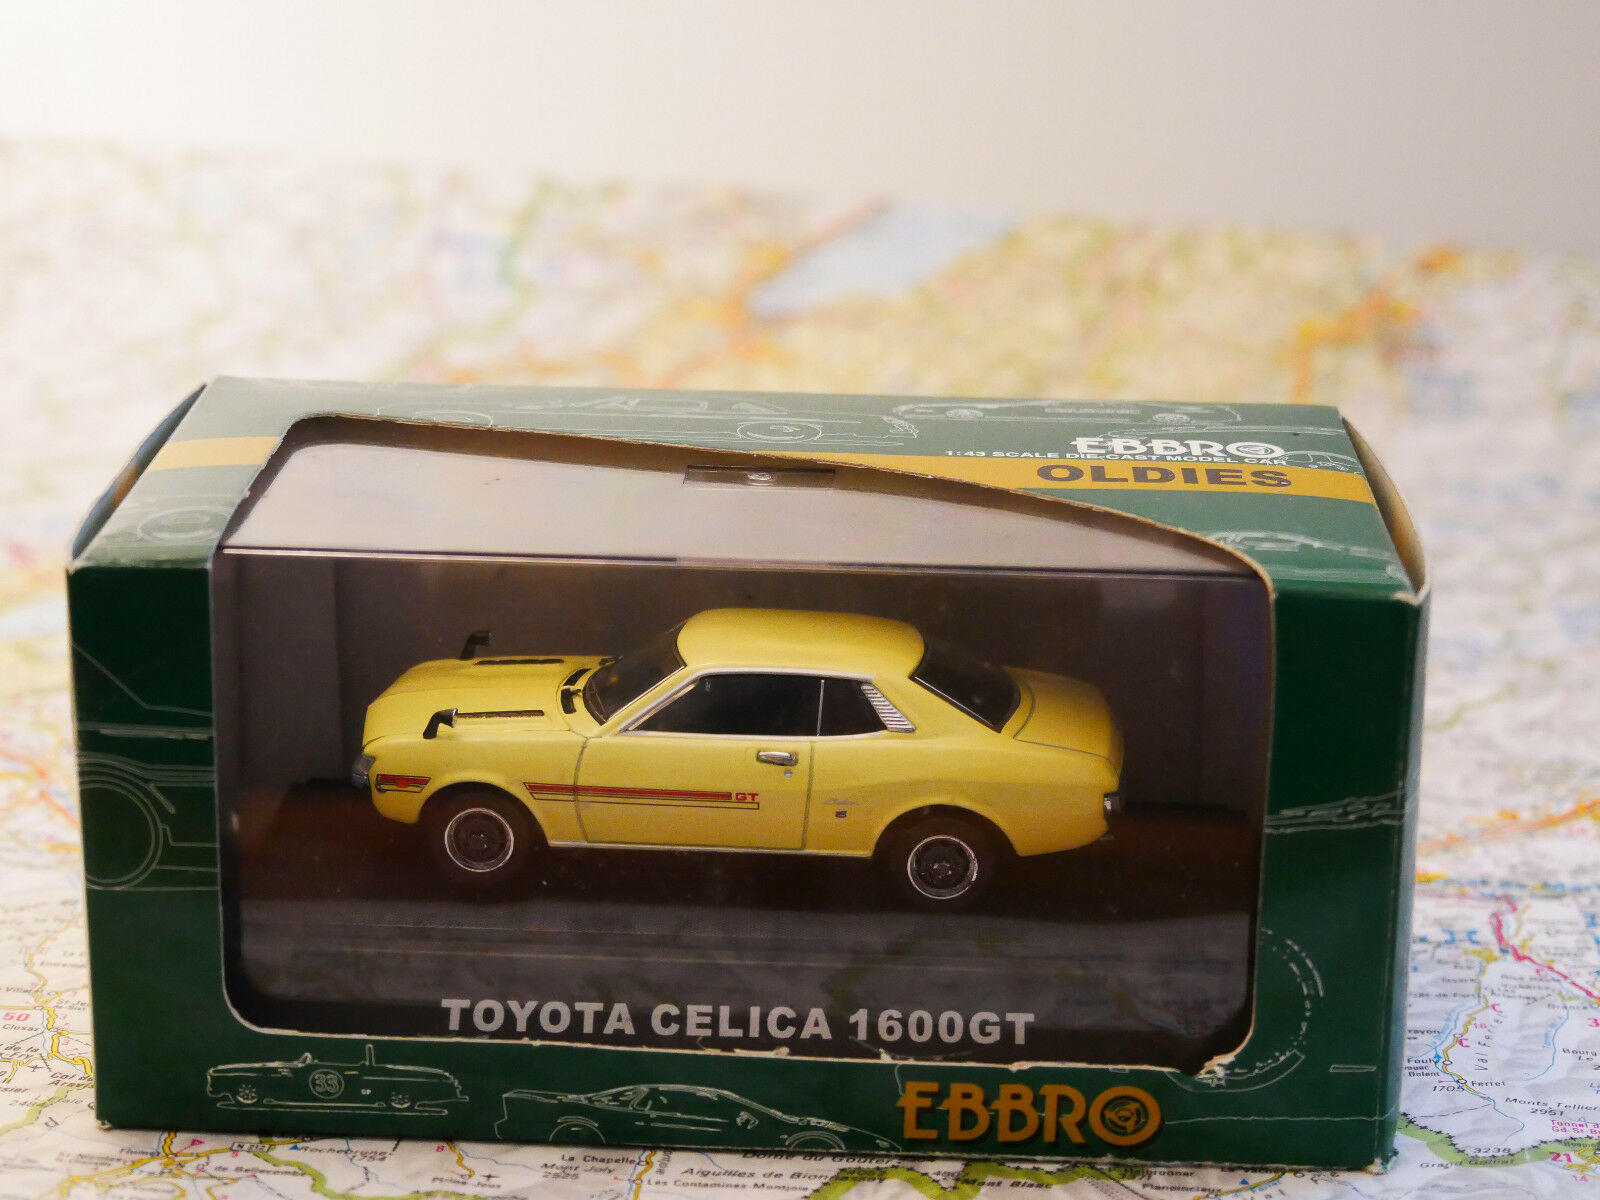 EBBRO Ebbro Toyota Celica 1600 GT  jaune ART.84 NEW DIE-CAST 1 43